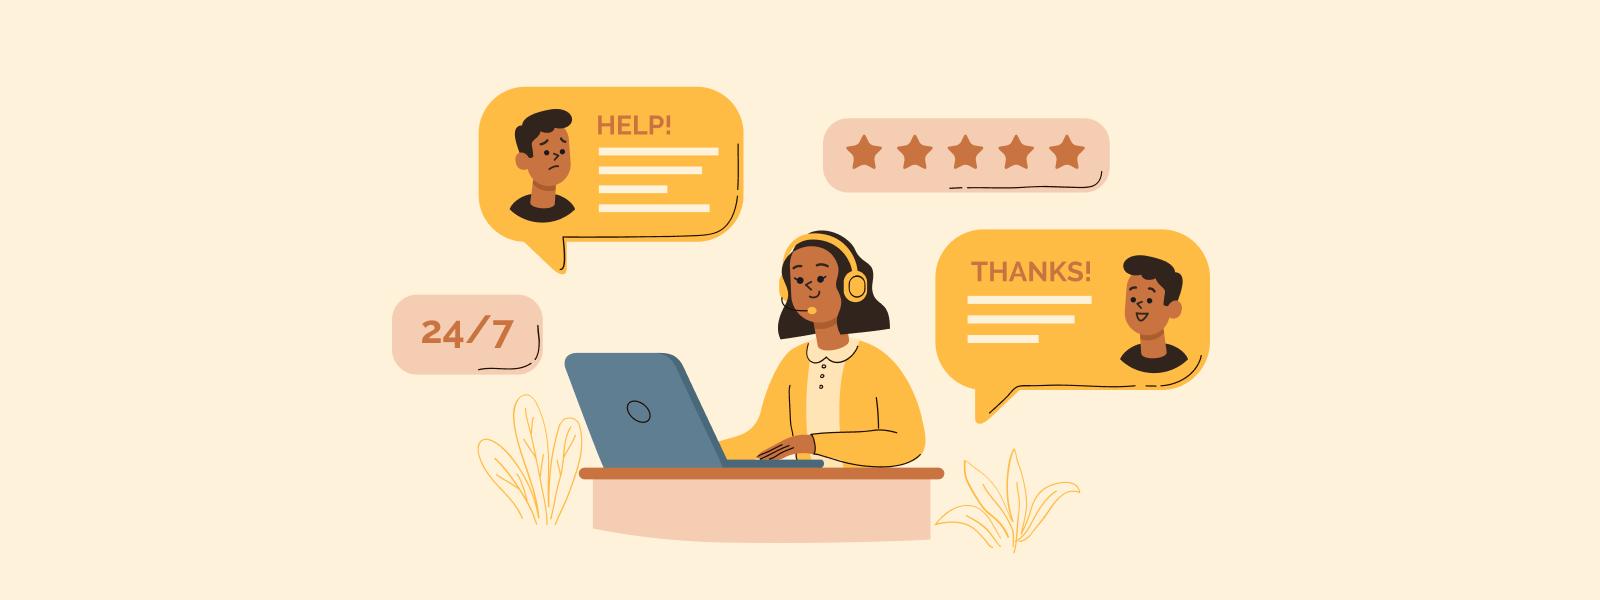 Conversational support